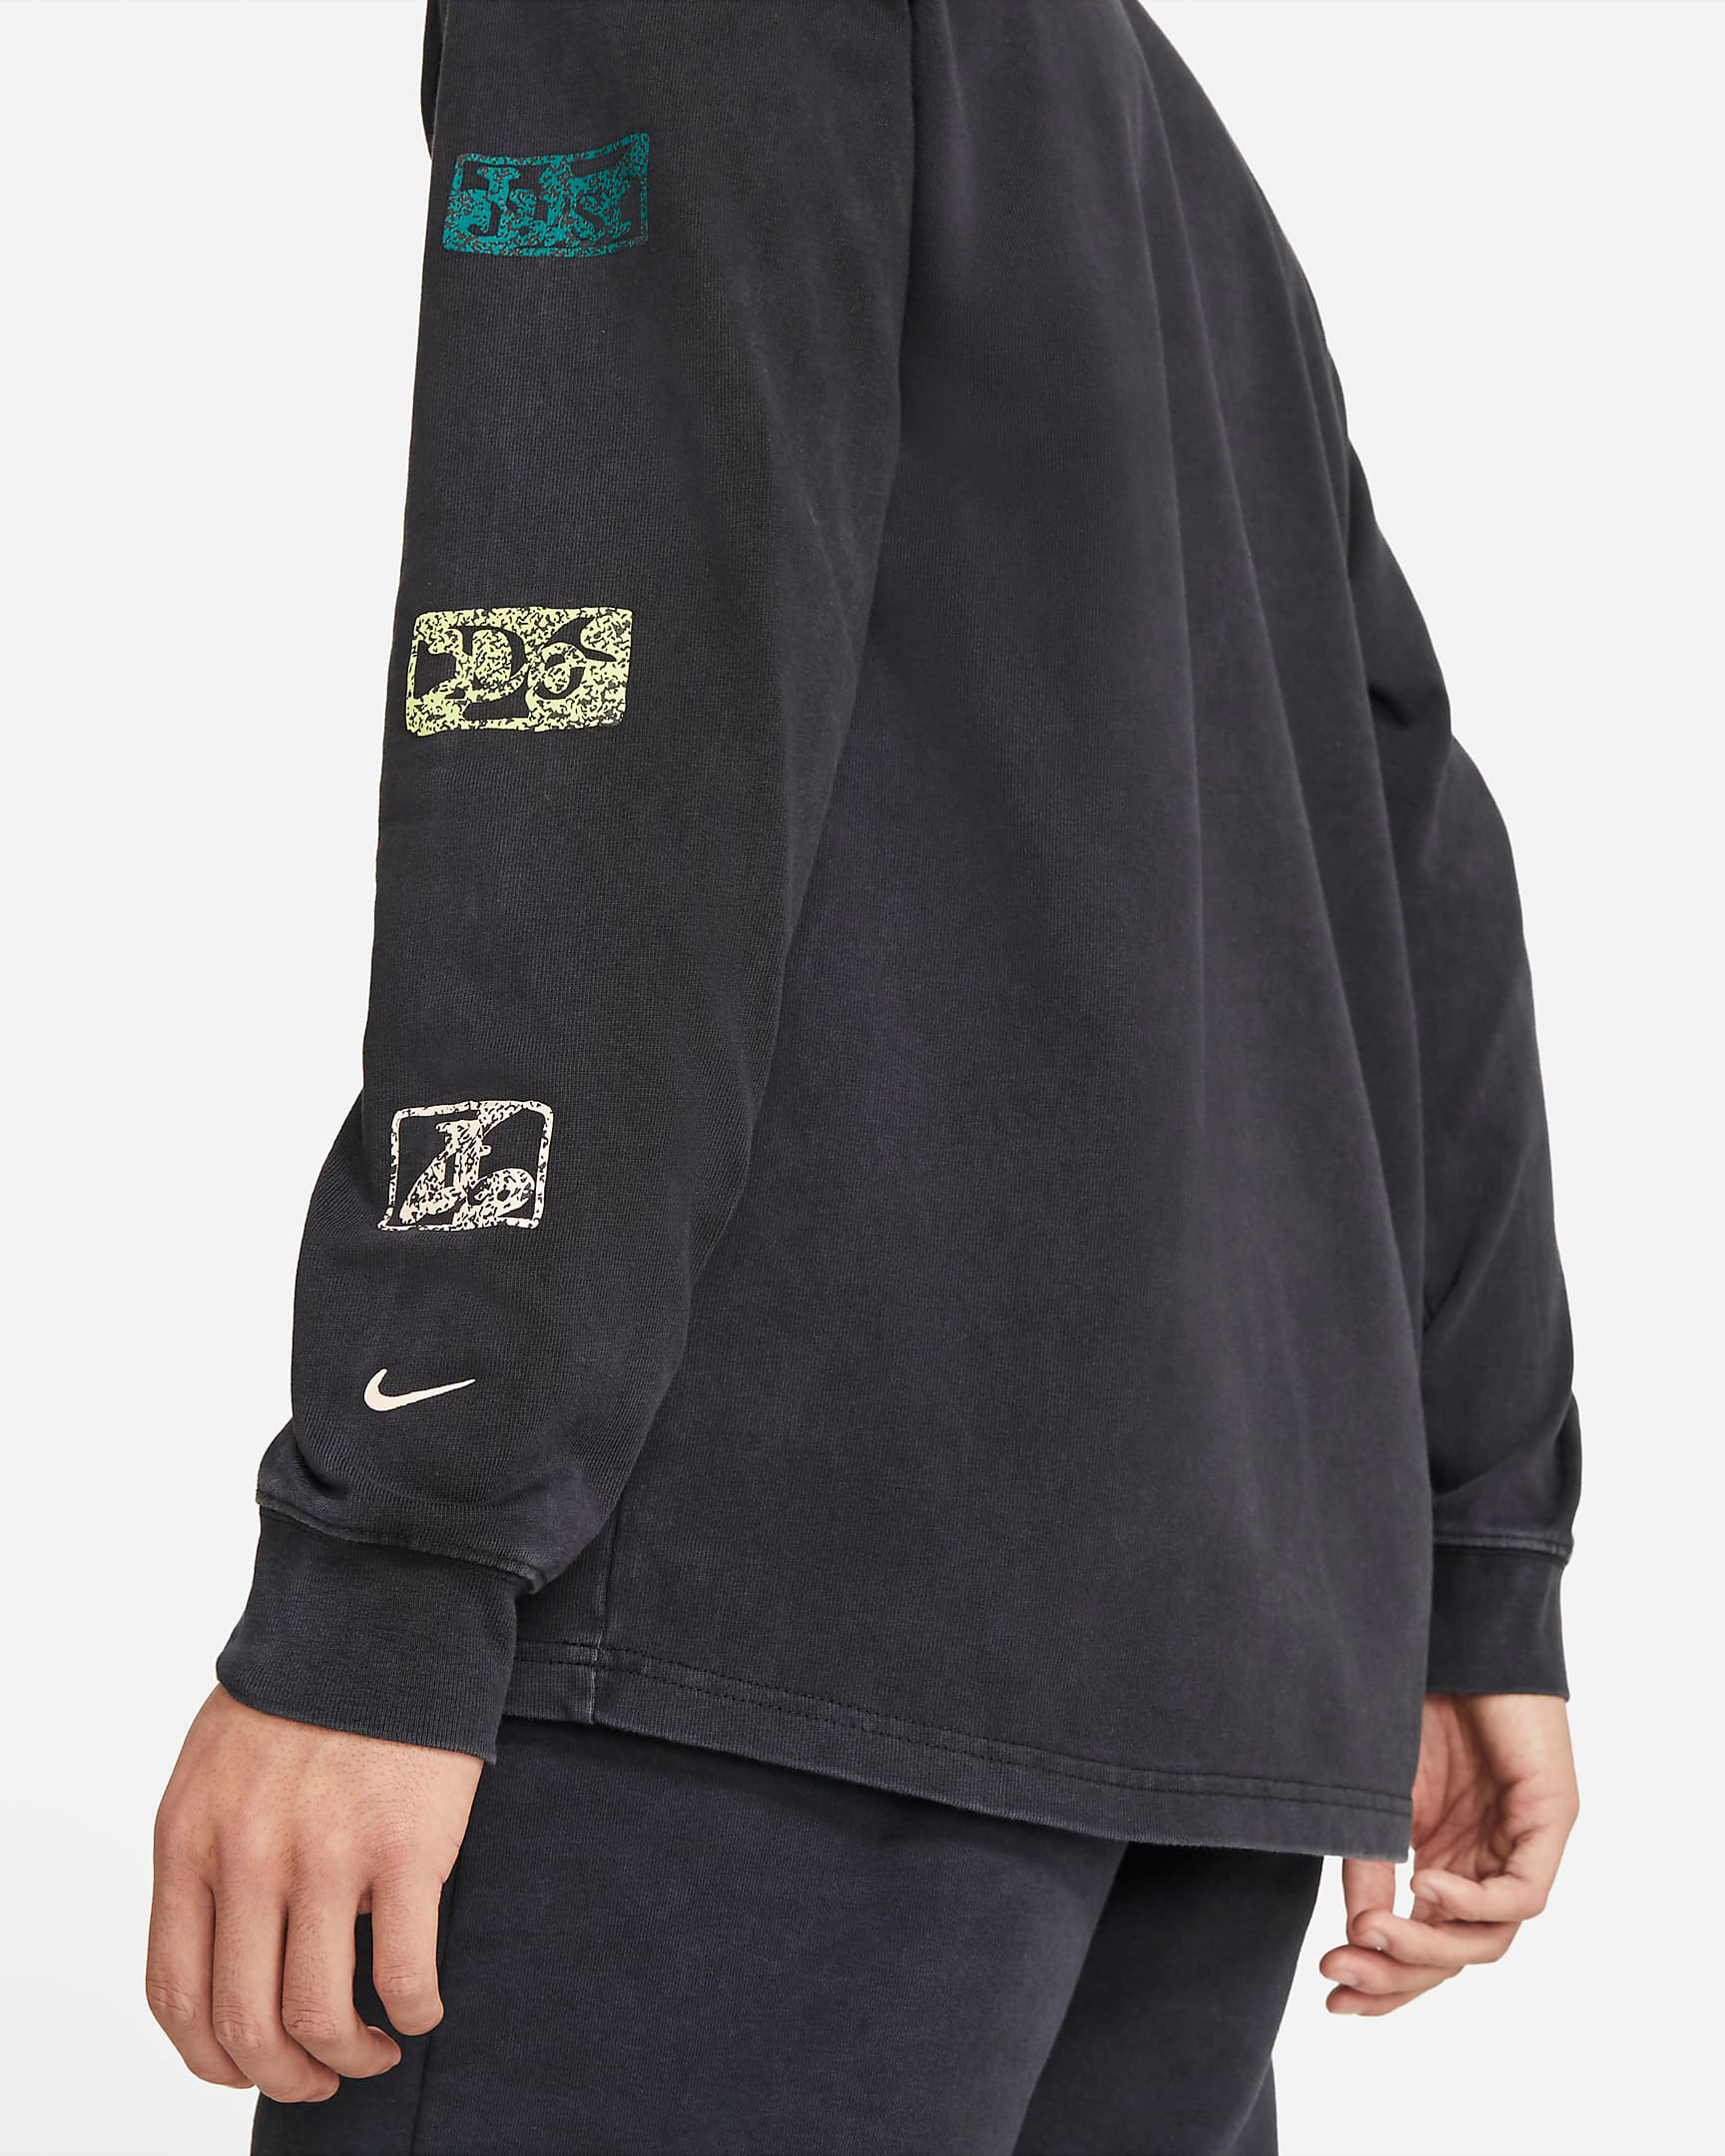 nike-air-max-90-spruce-lime-long-sleeve-shirt-7